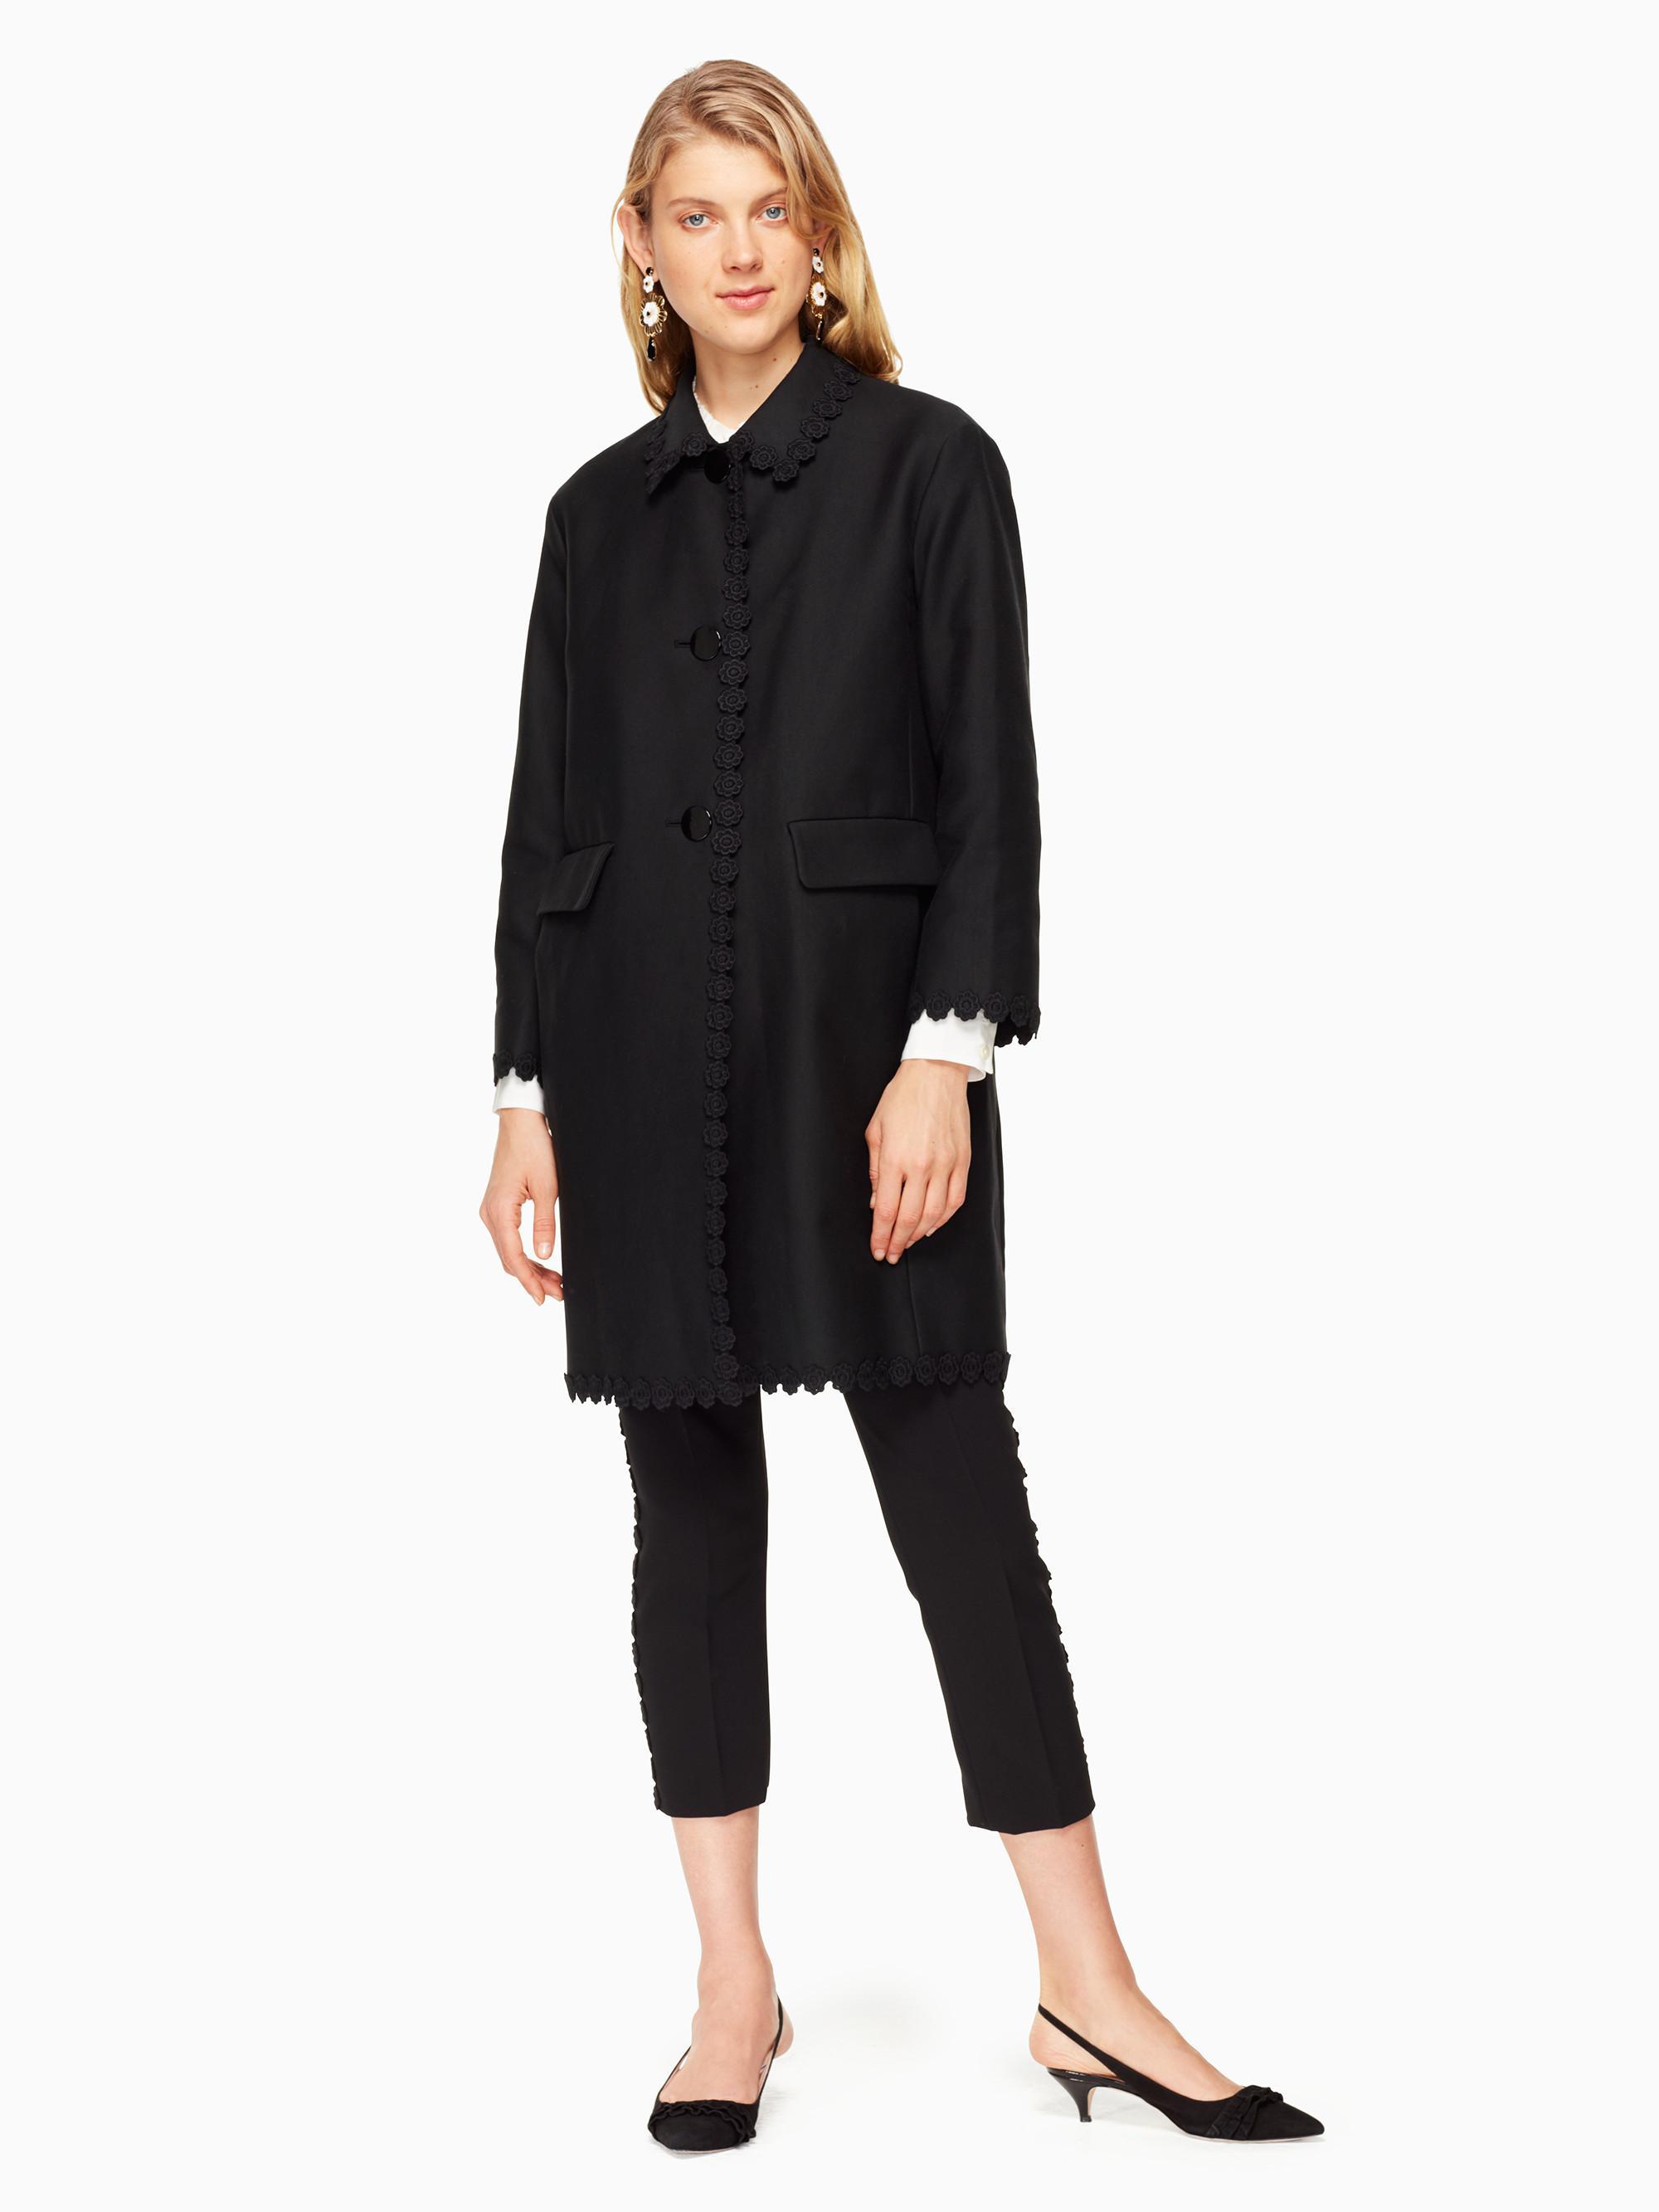 Kate Spade Floral Lace Trim Coat In Black Lyst